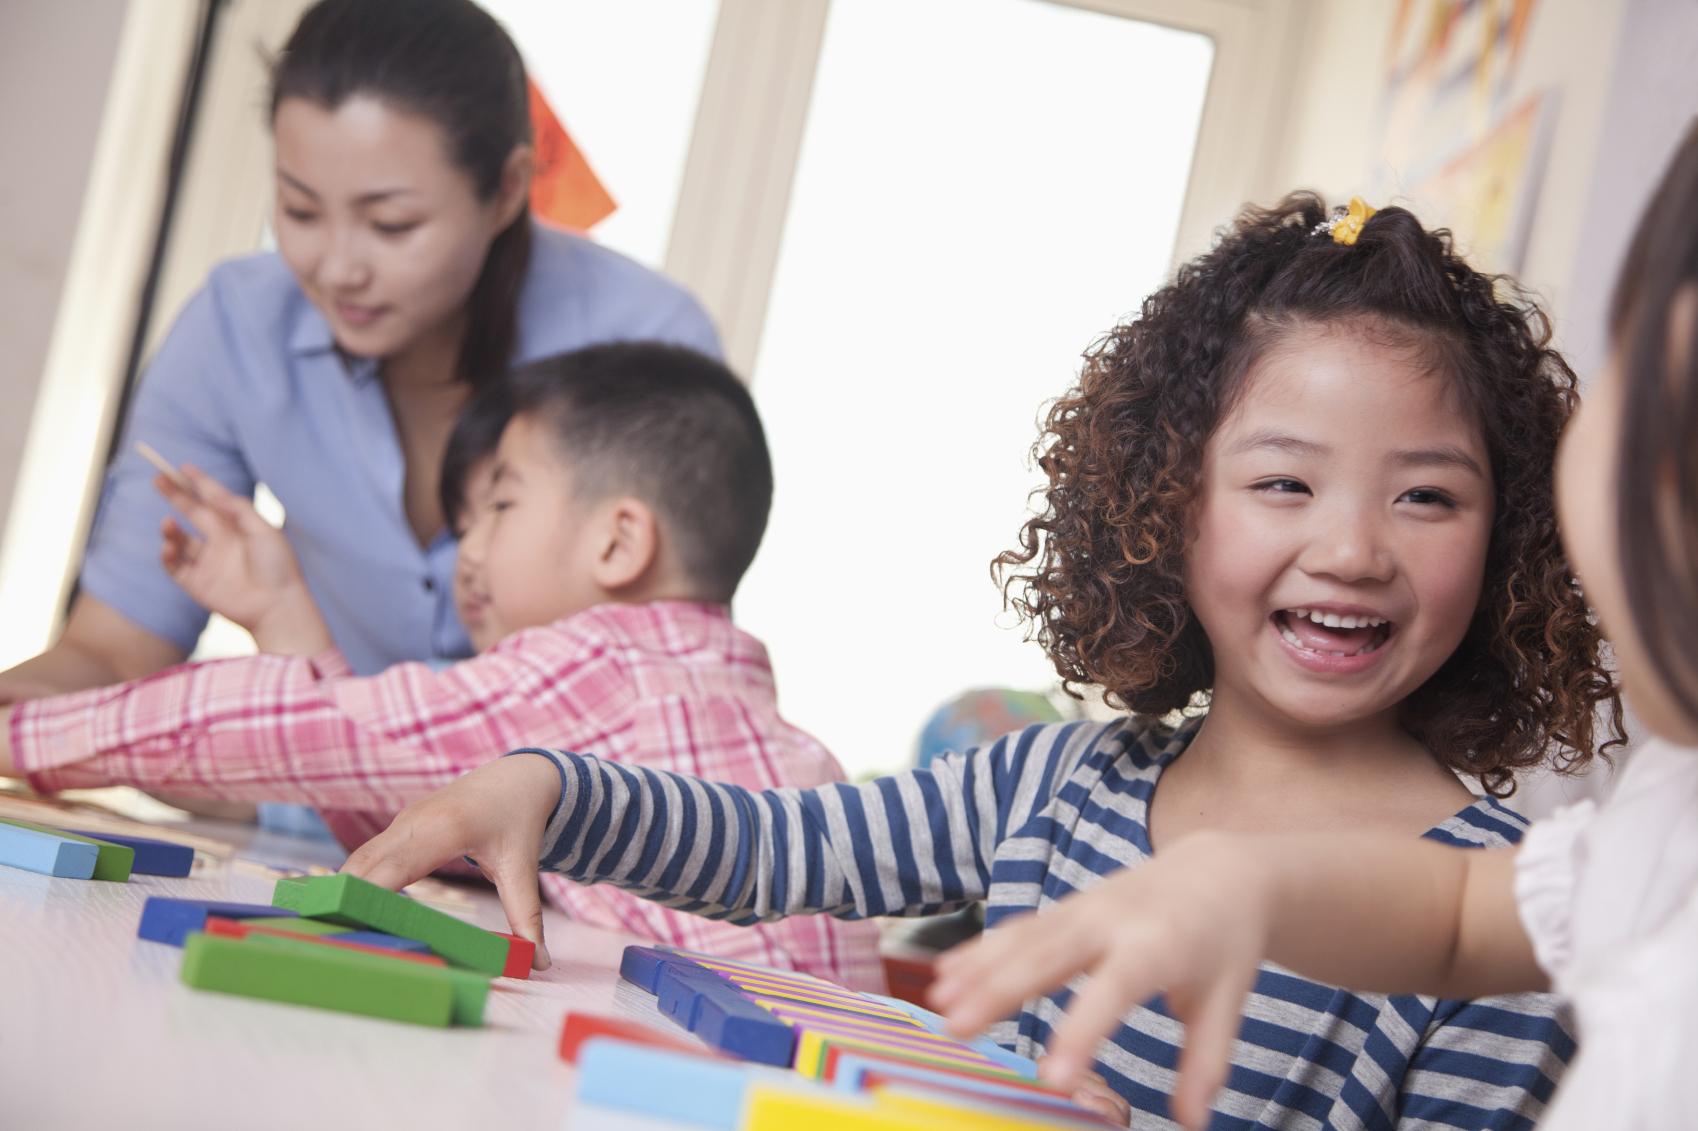 Children and Preschool Curriculum Q & A